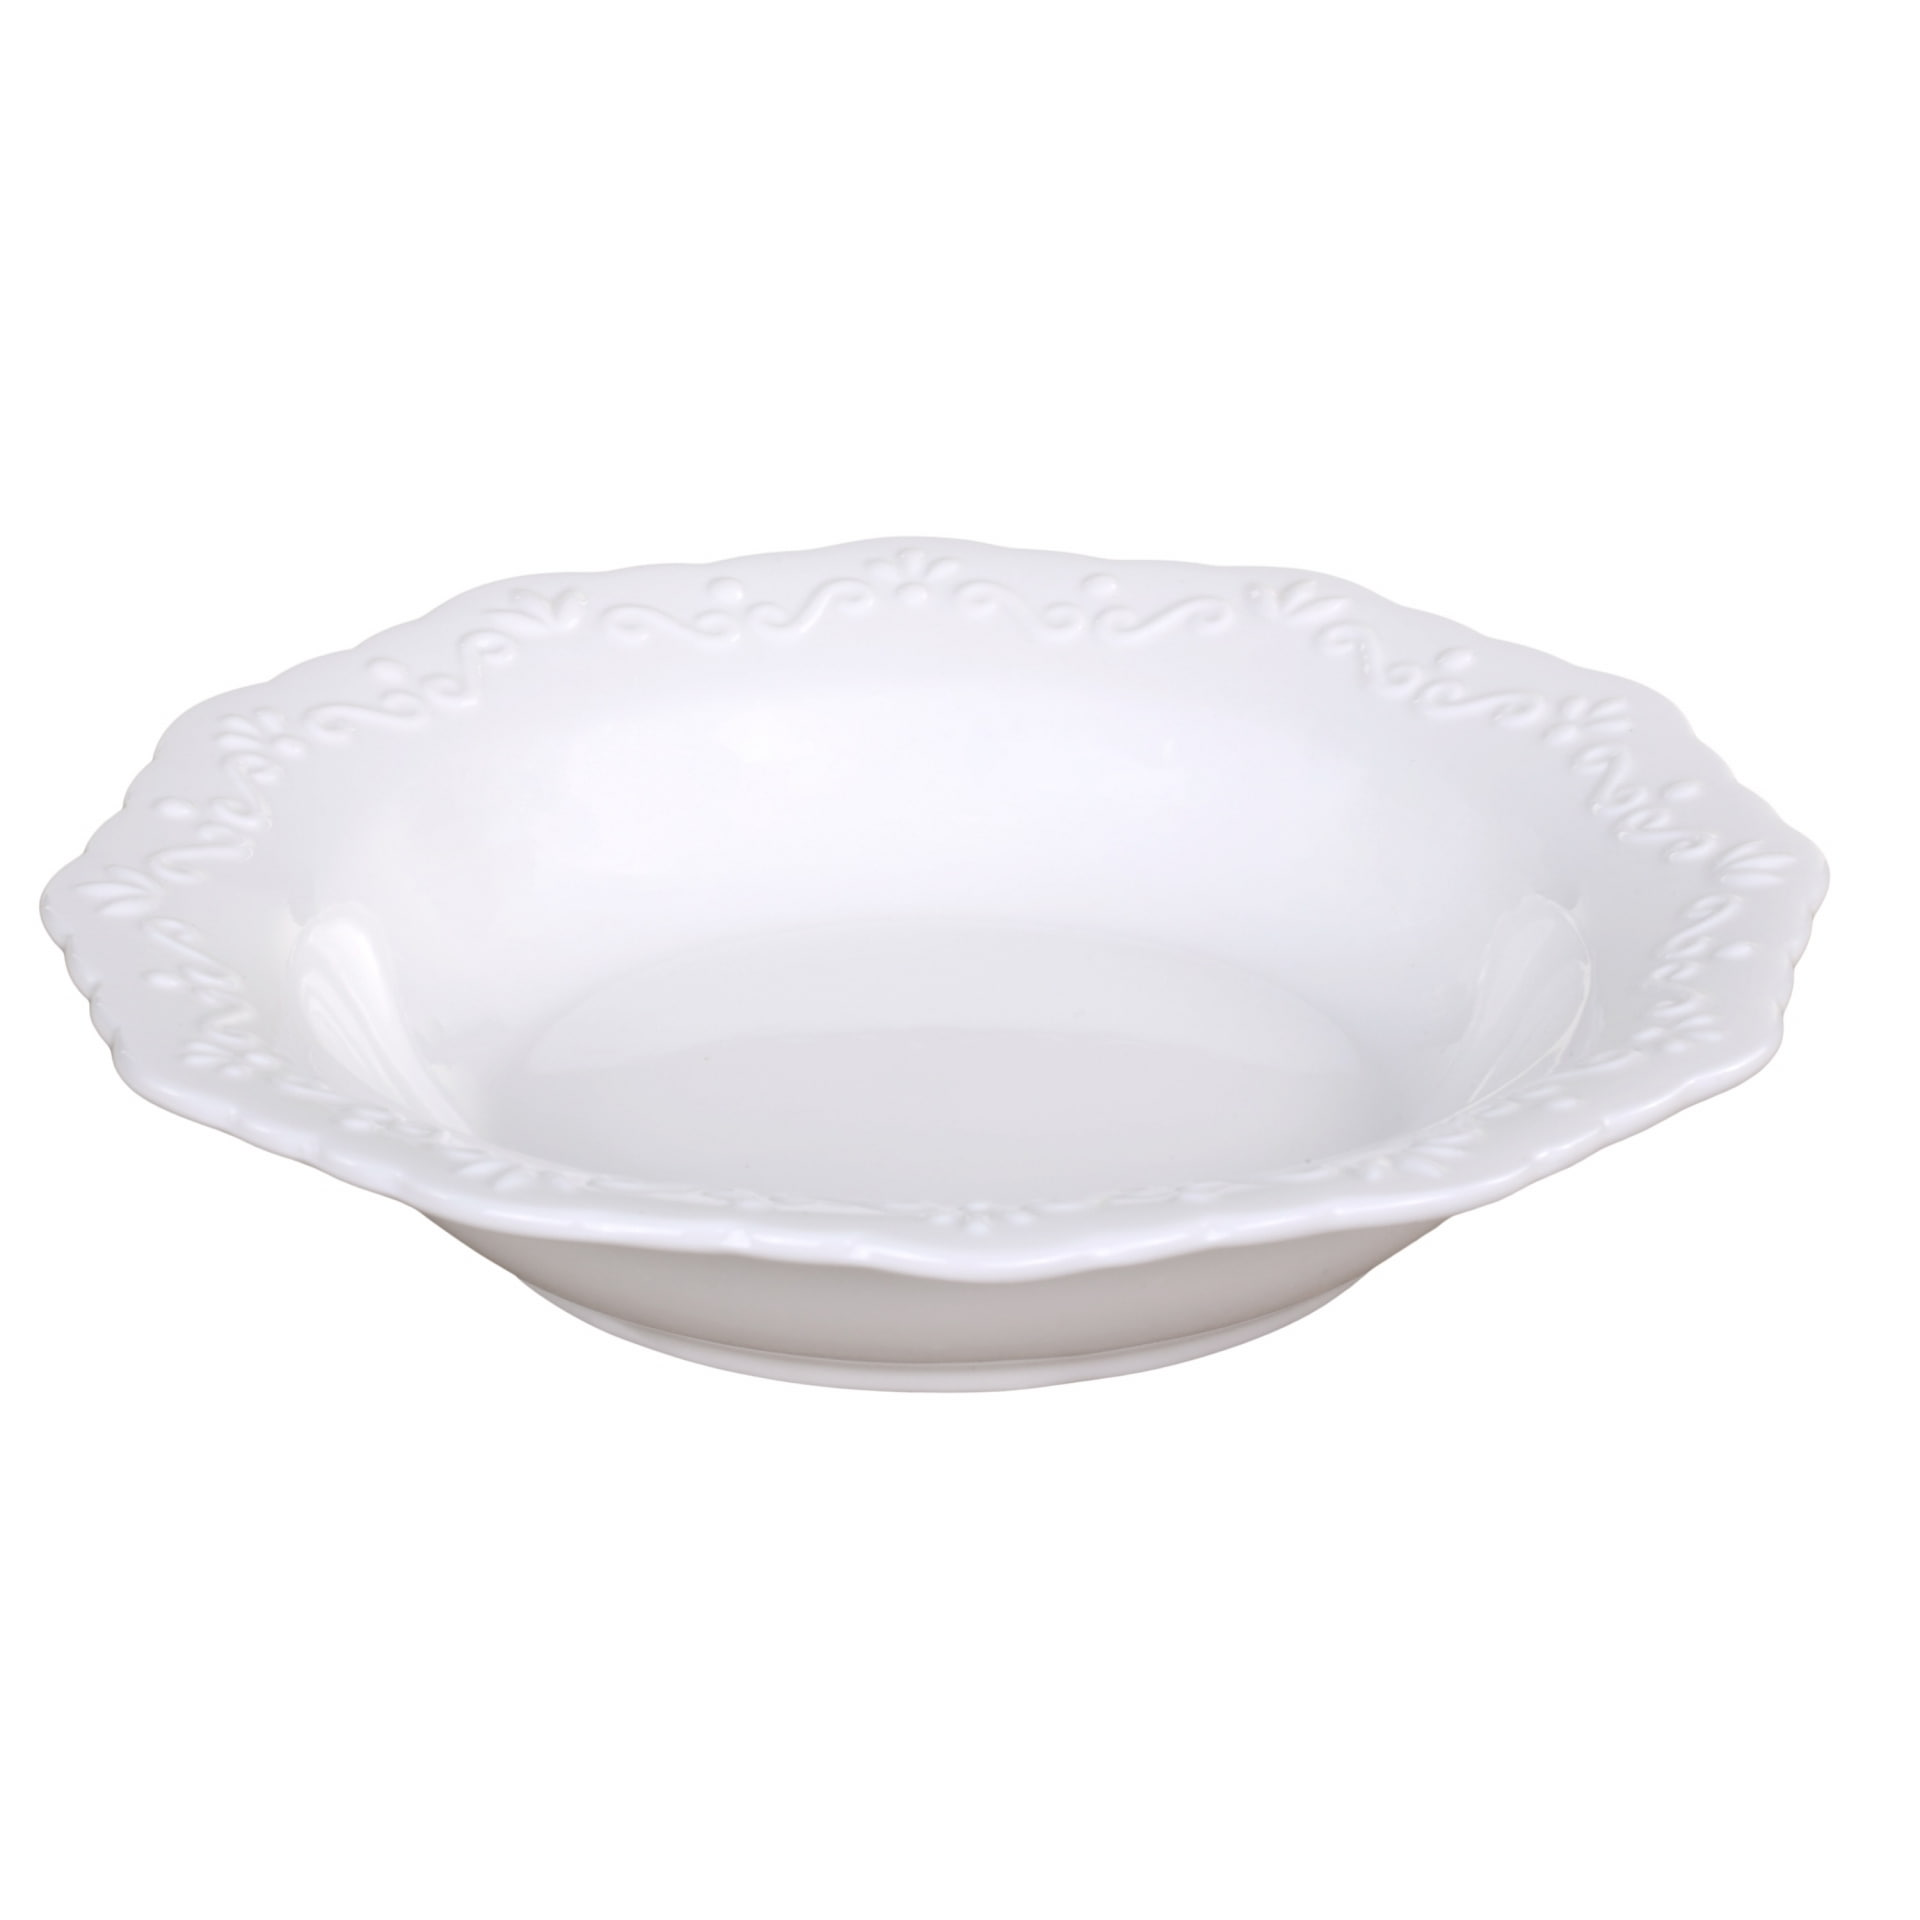 Chic Antique Porcelánový polévkový talíř Provence, bílá barva, porcelán